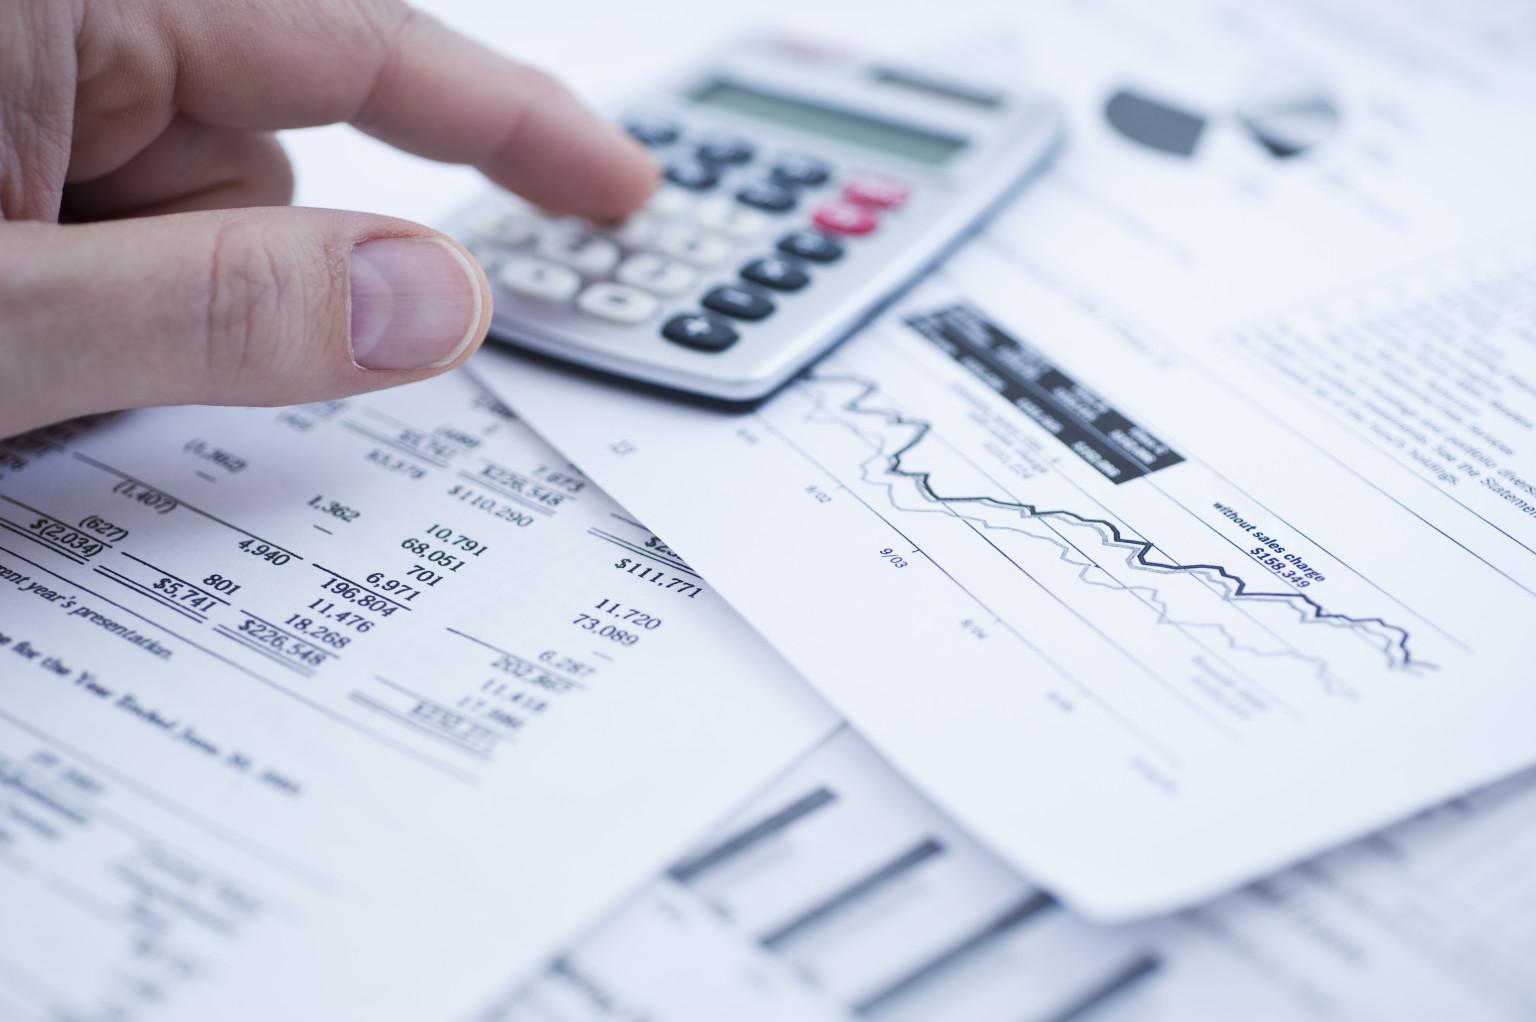 FINANCIAL ENTREPRENEUR PLANNING